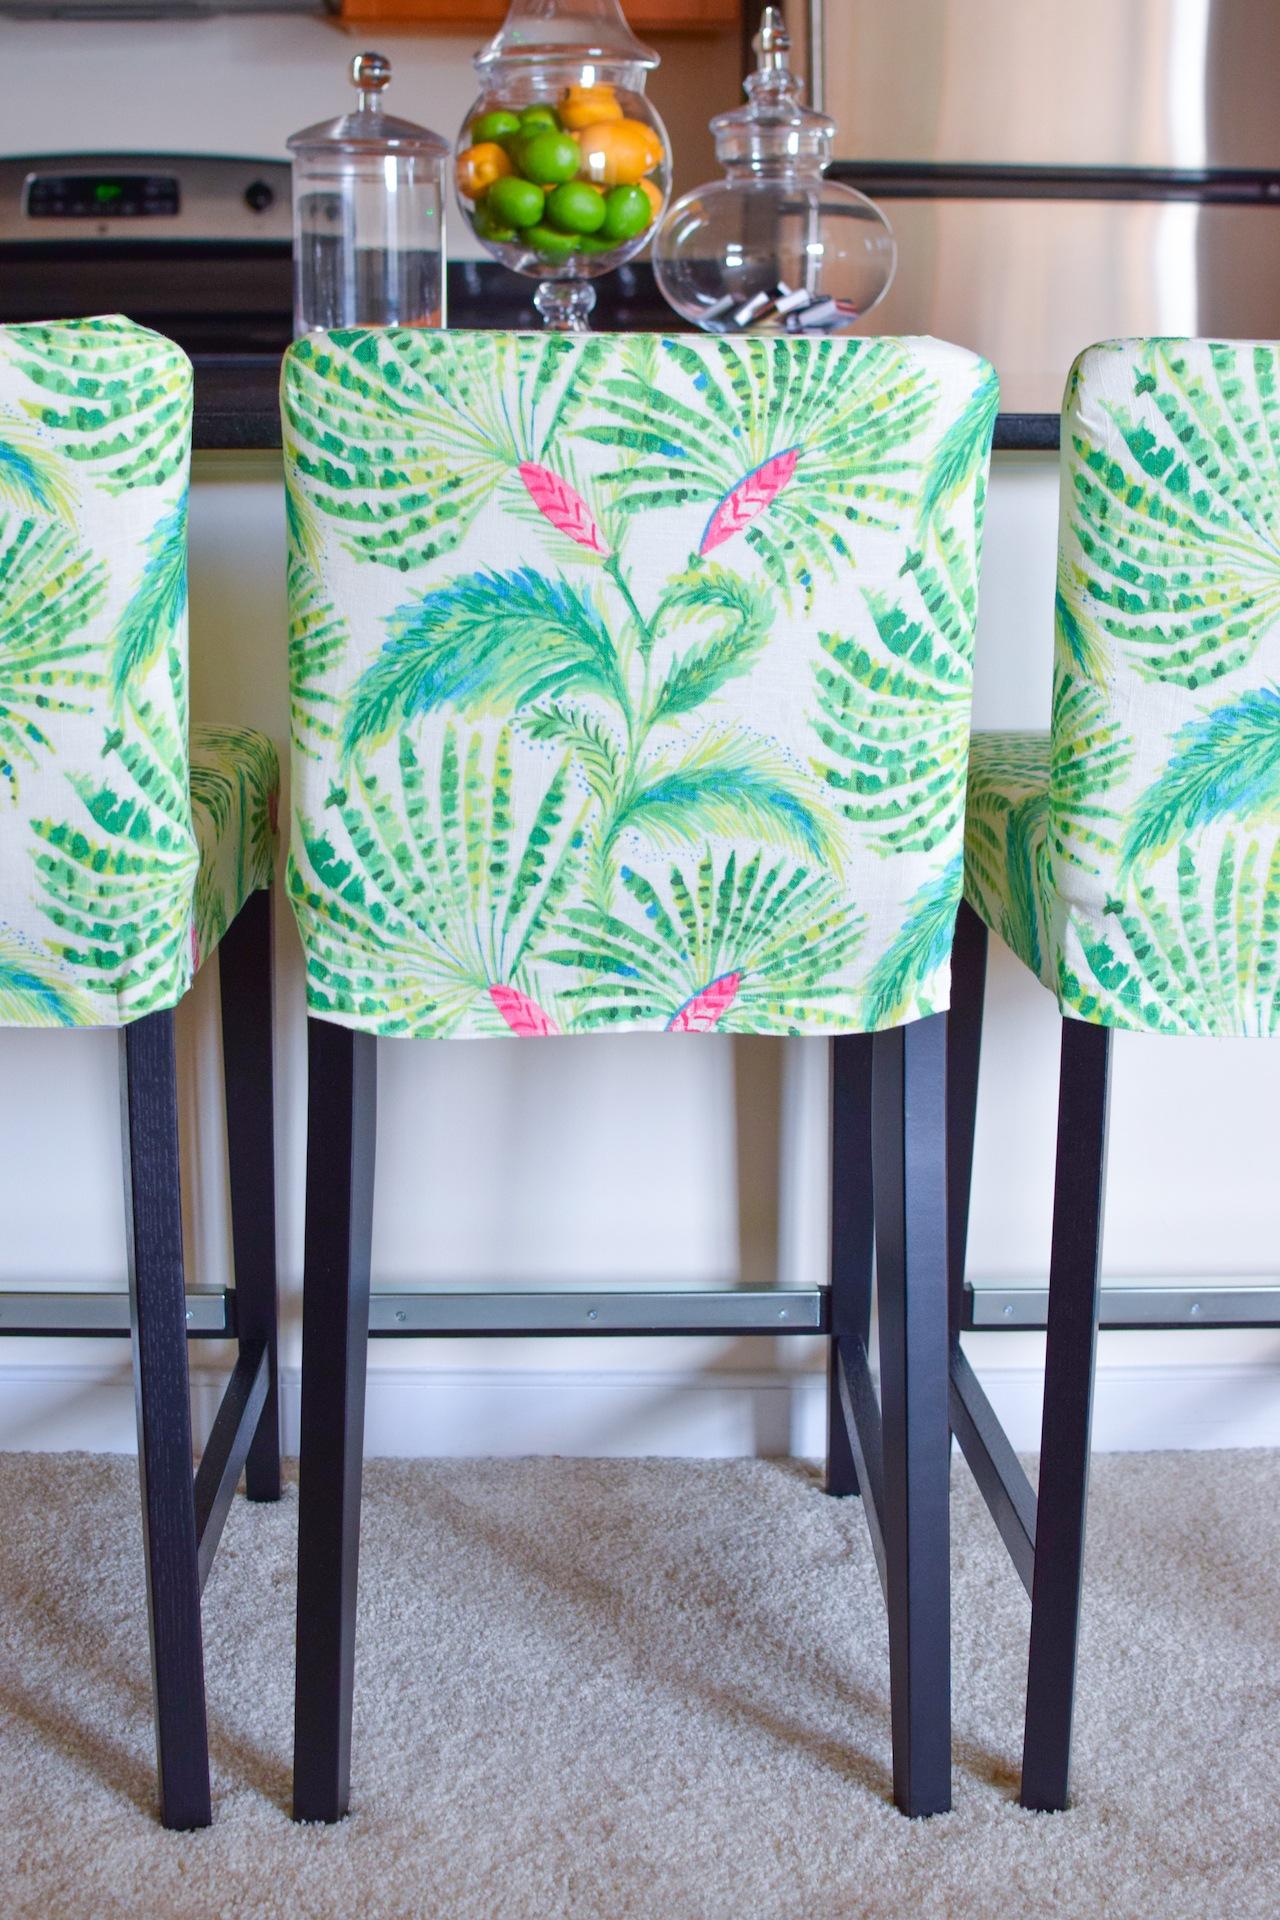 Outstanding Ikea Henriksdal Bar Stool Slipcover Rockin Cushions A Machost Co Dining Chair Design Ideas Machostcouk